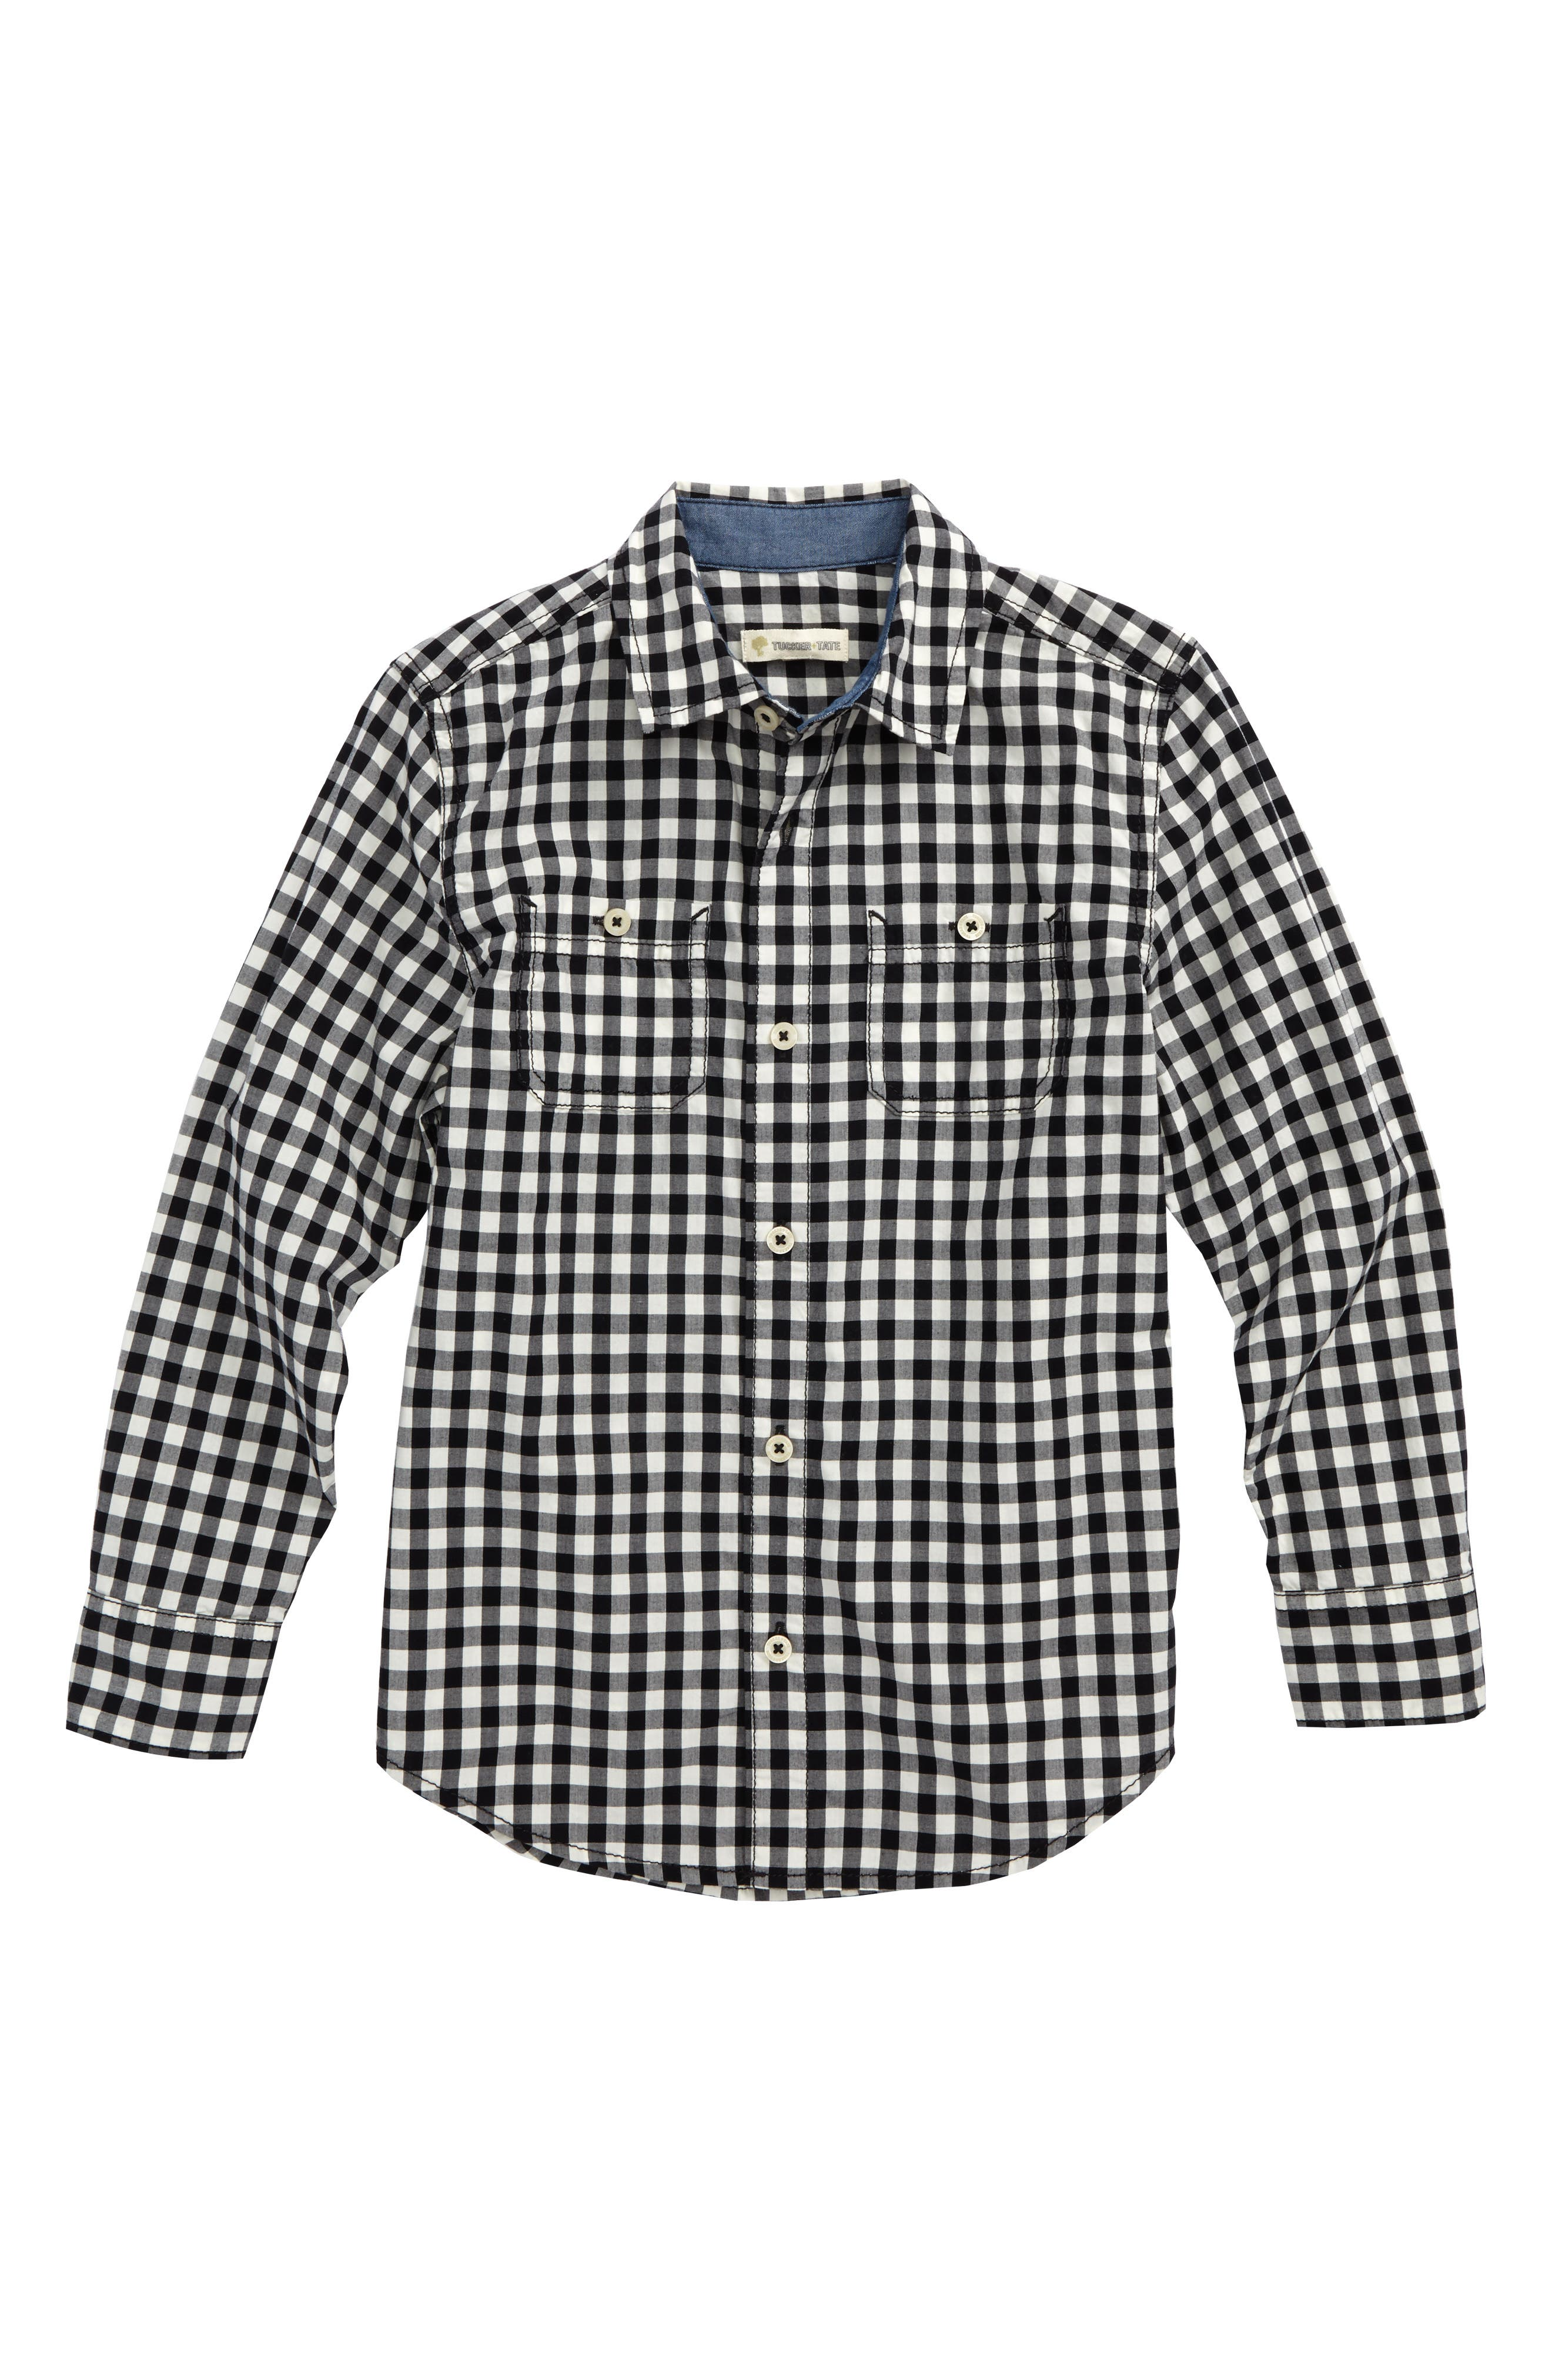 'Photo' Buffalo Plaid Woven Shirt,                         Main,                         color, Black- Ivory Gingham